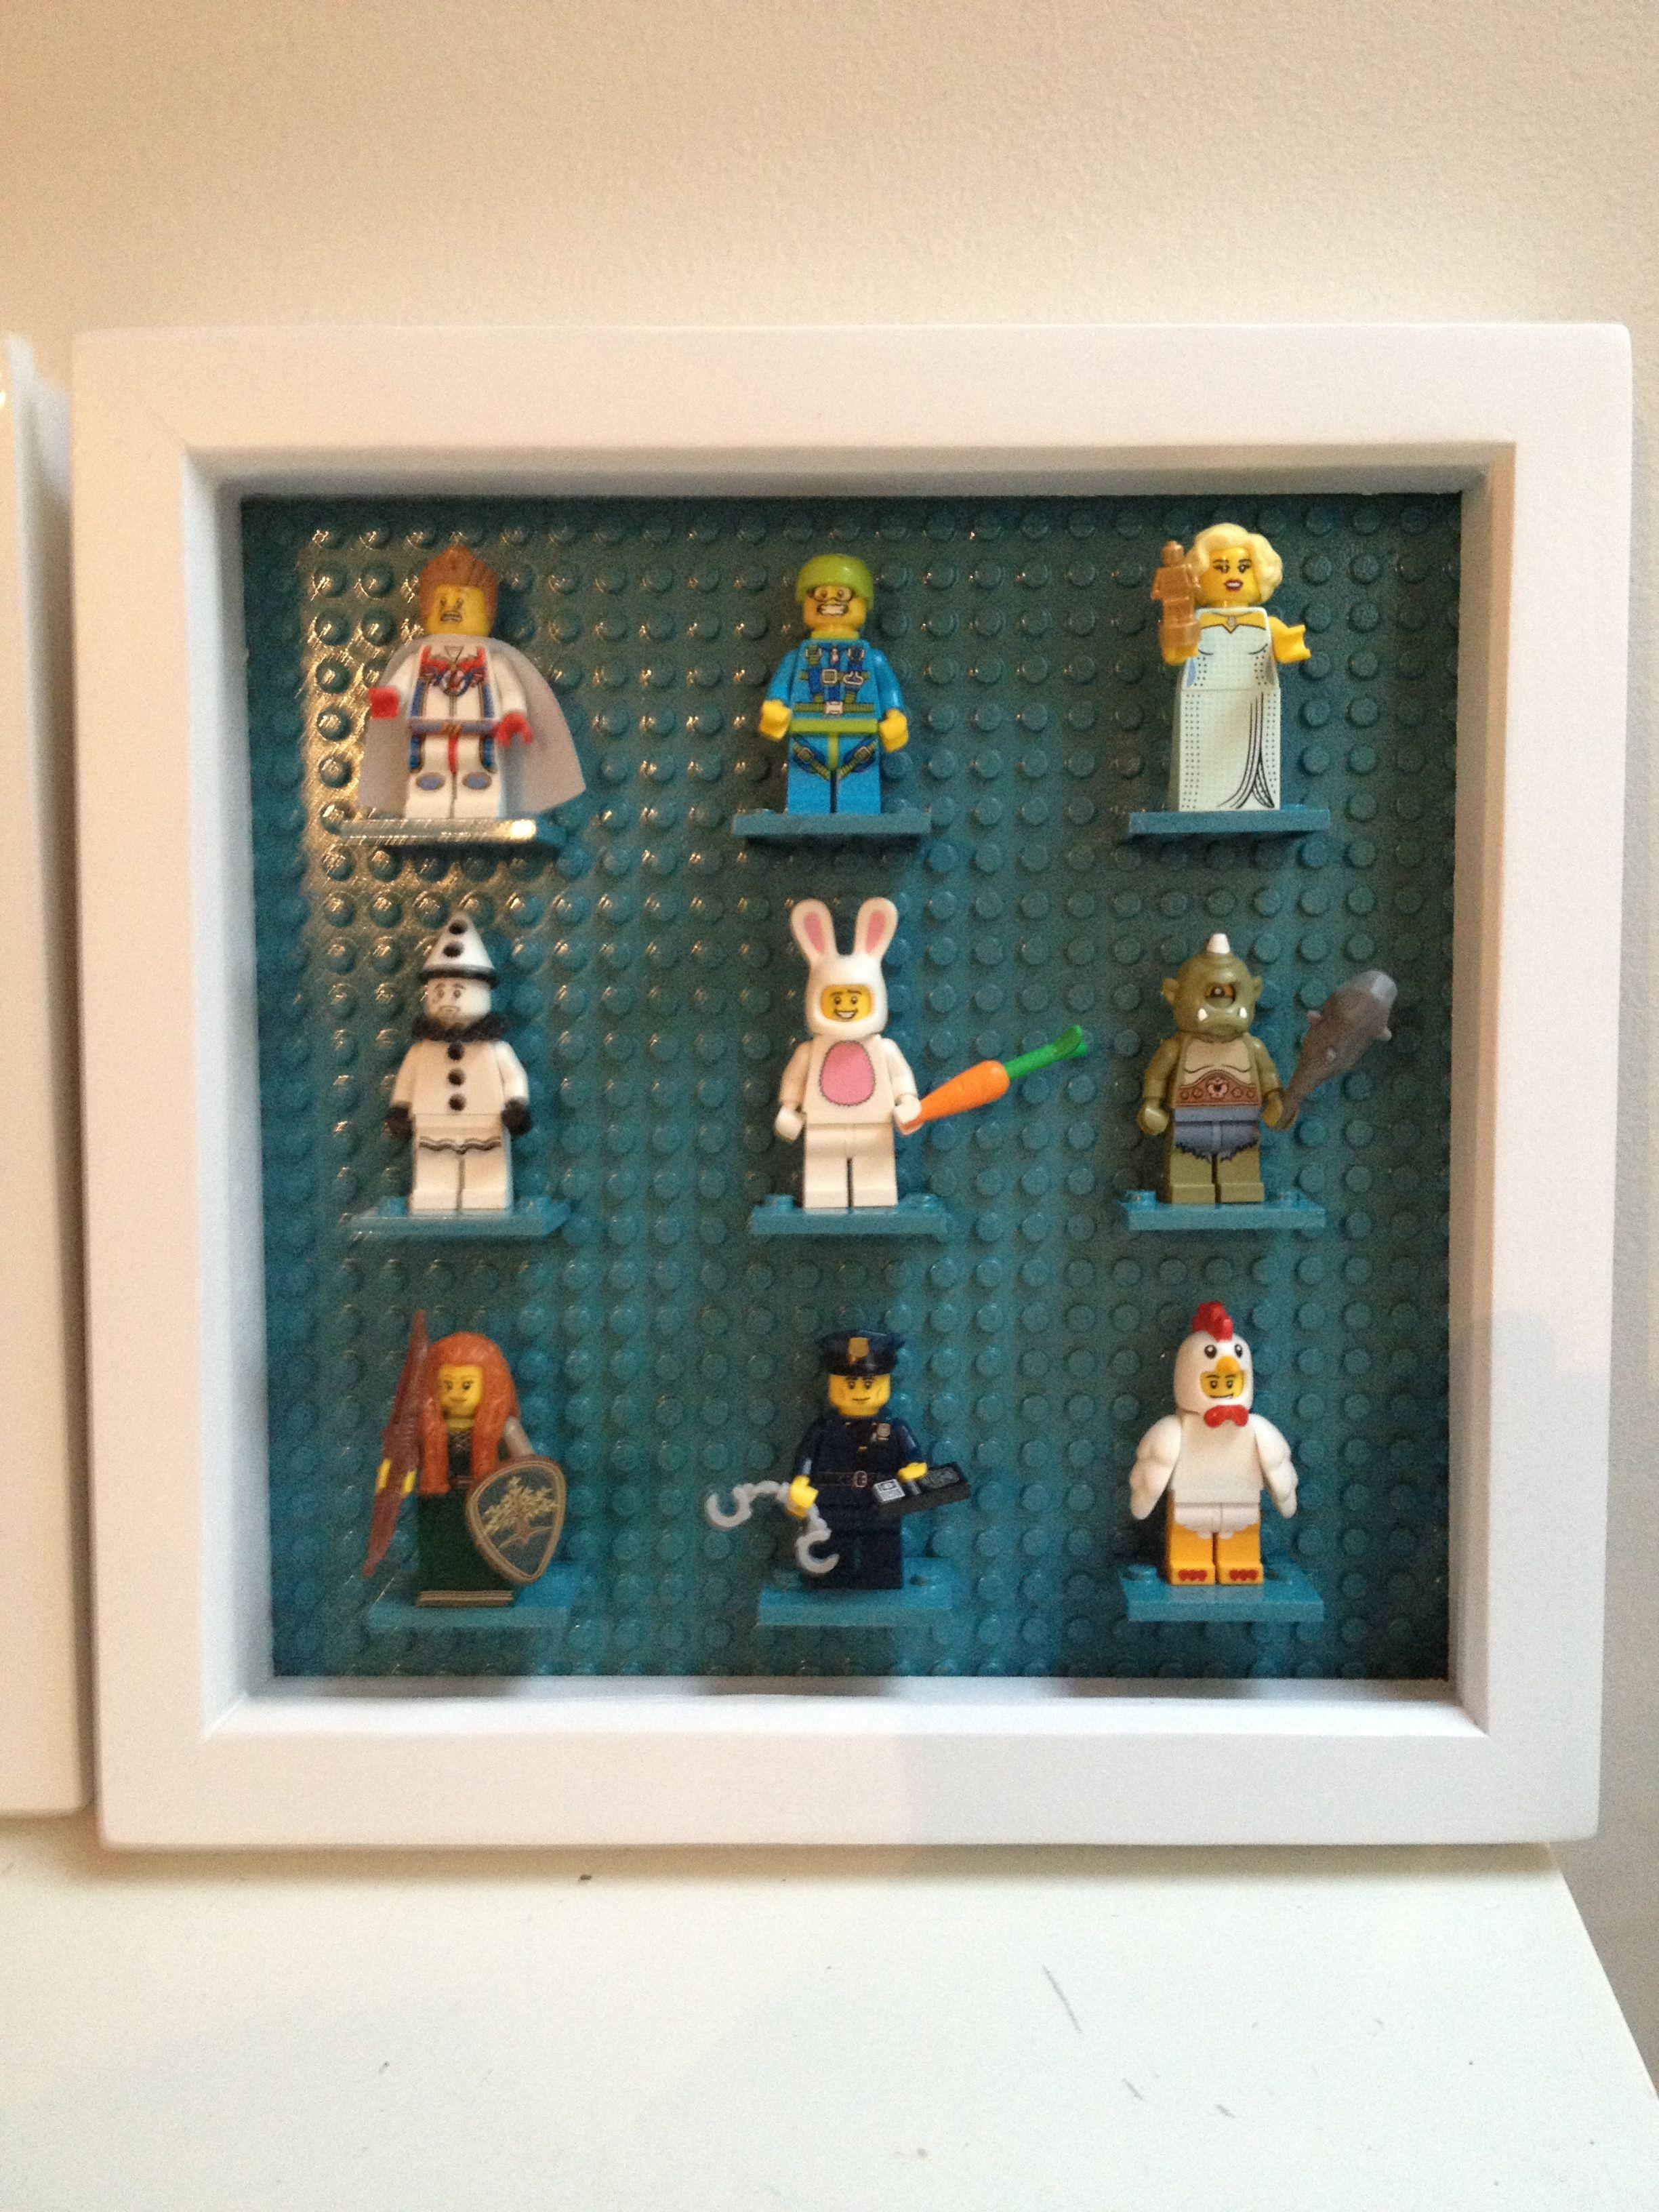 Lego mini figure display. Deep frame, lego building plate and figure ...